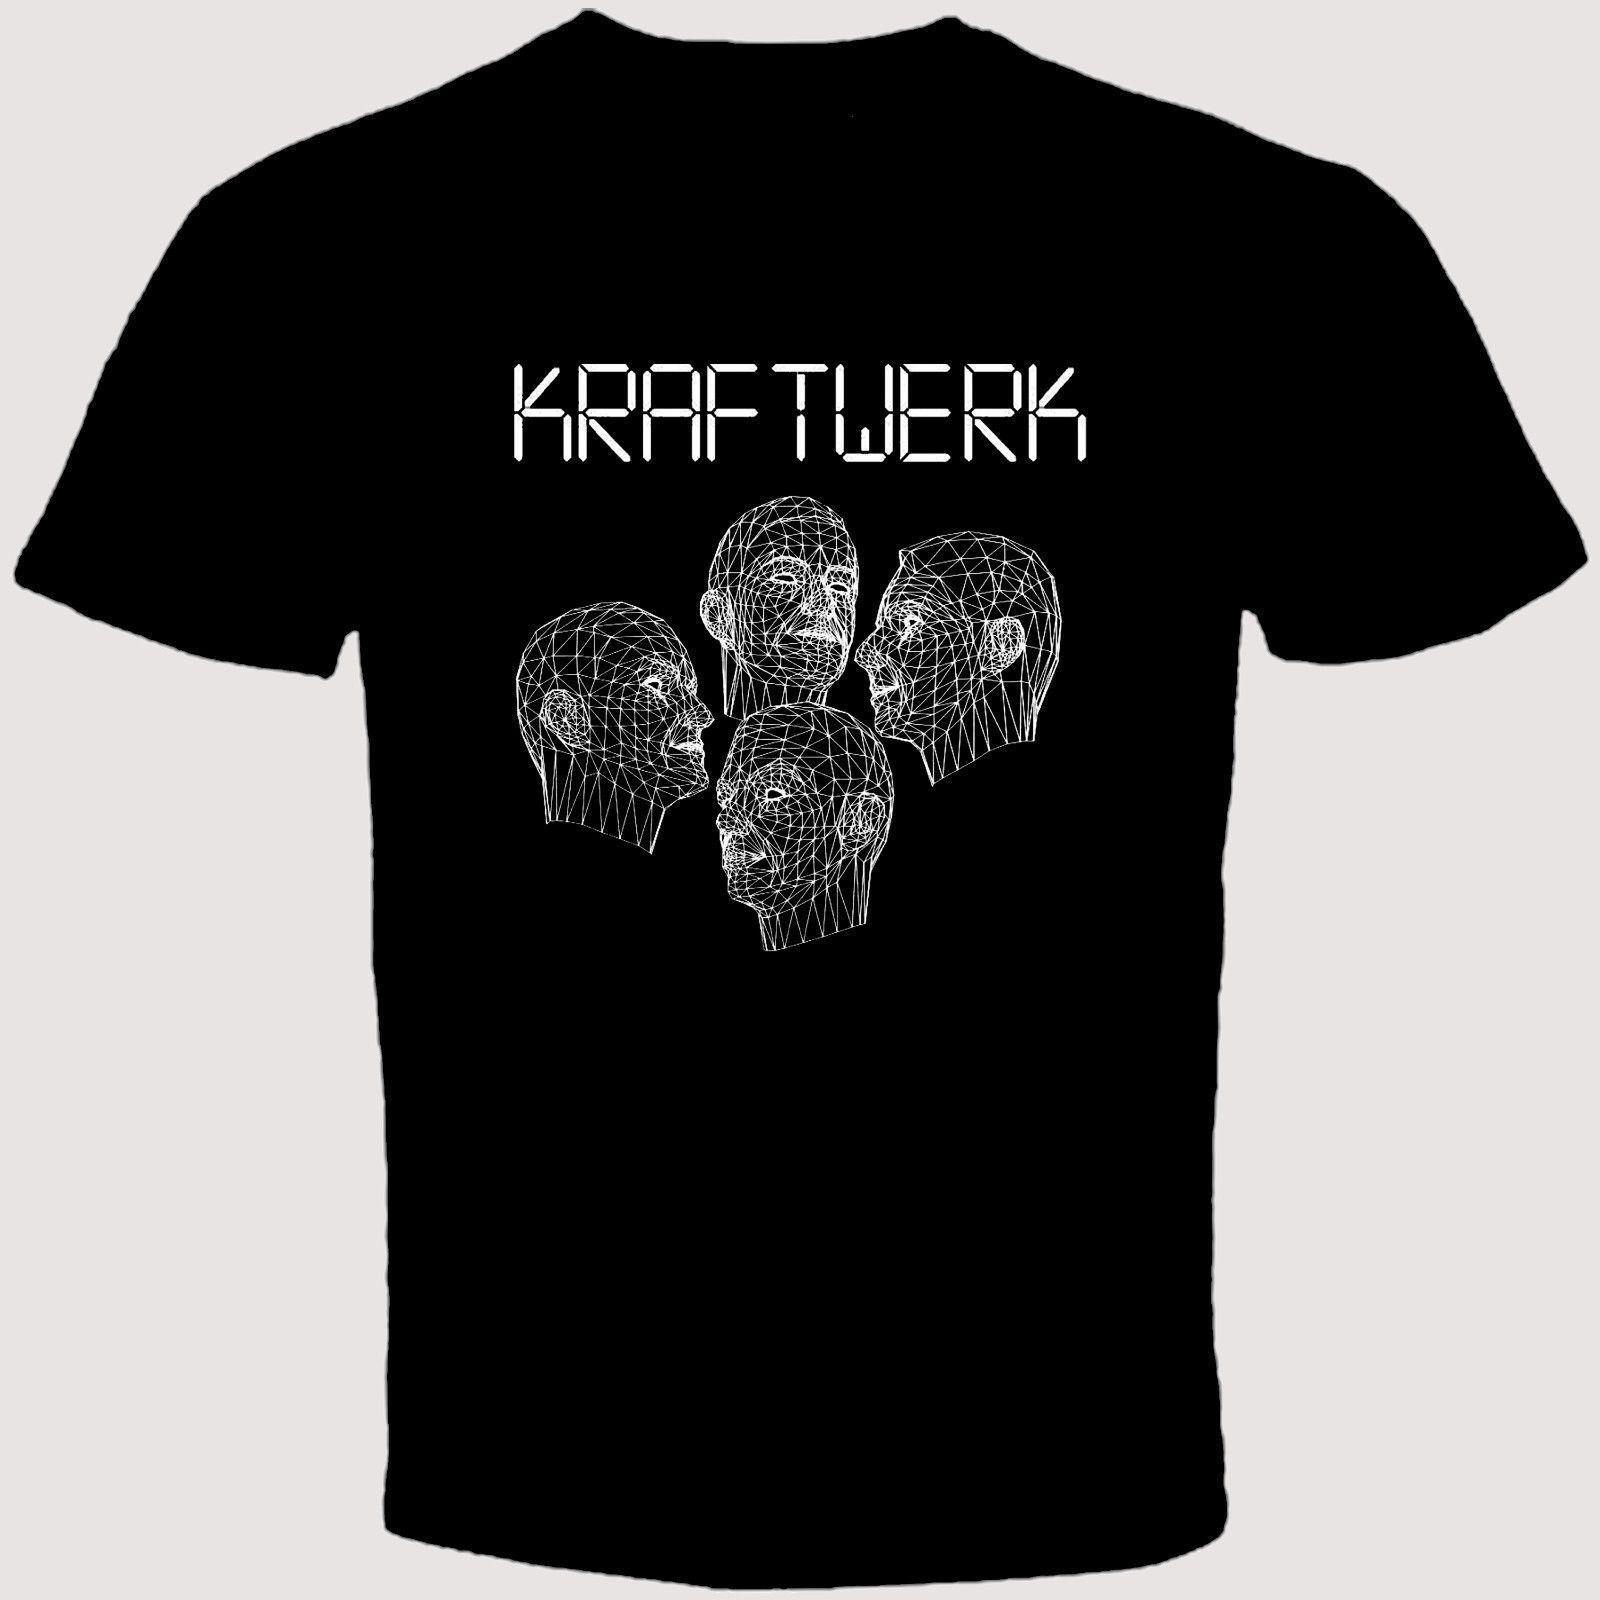 New KRAFTWERK Human Robots Electronic Band T Shirt New 2018 Hot Summer Casual T-Shirt Printing New Arrival MenS Short